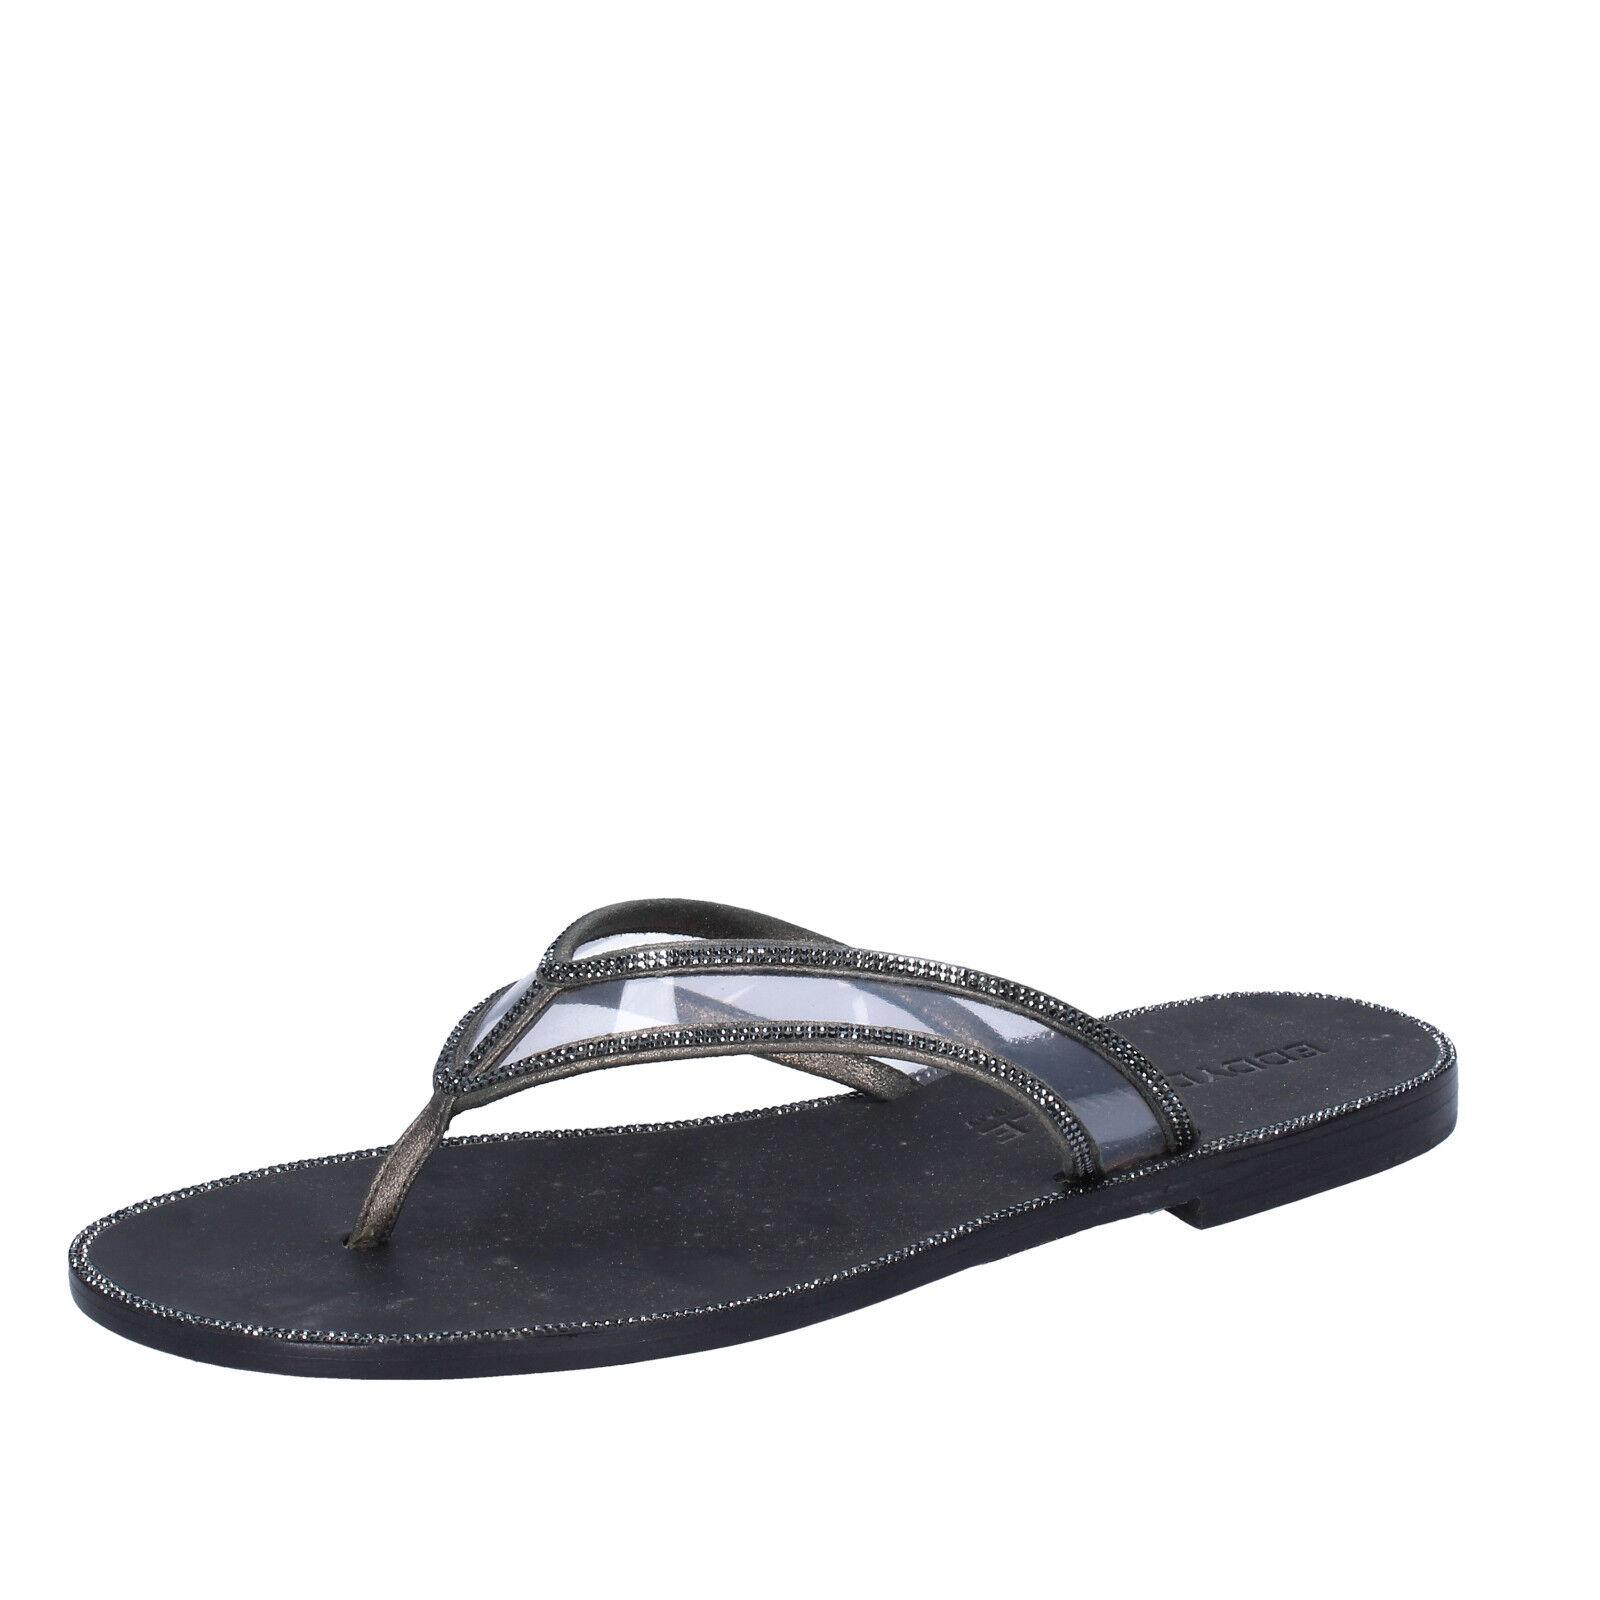 Damen schuhe EDDY DANIELE 37 EU Sandale grau schwarz schwarz schwarz leder swarovski AW682 7eae3b